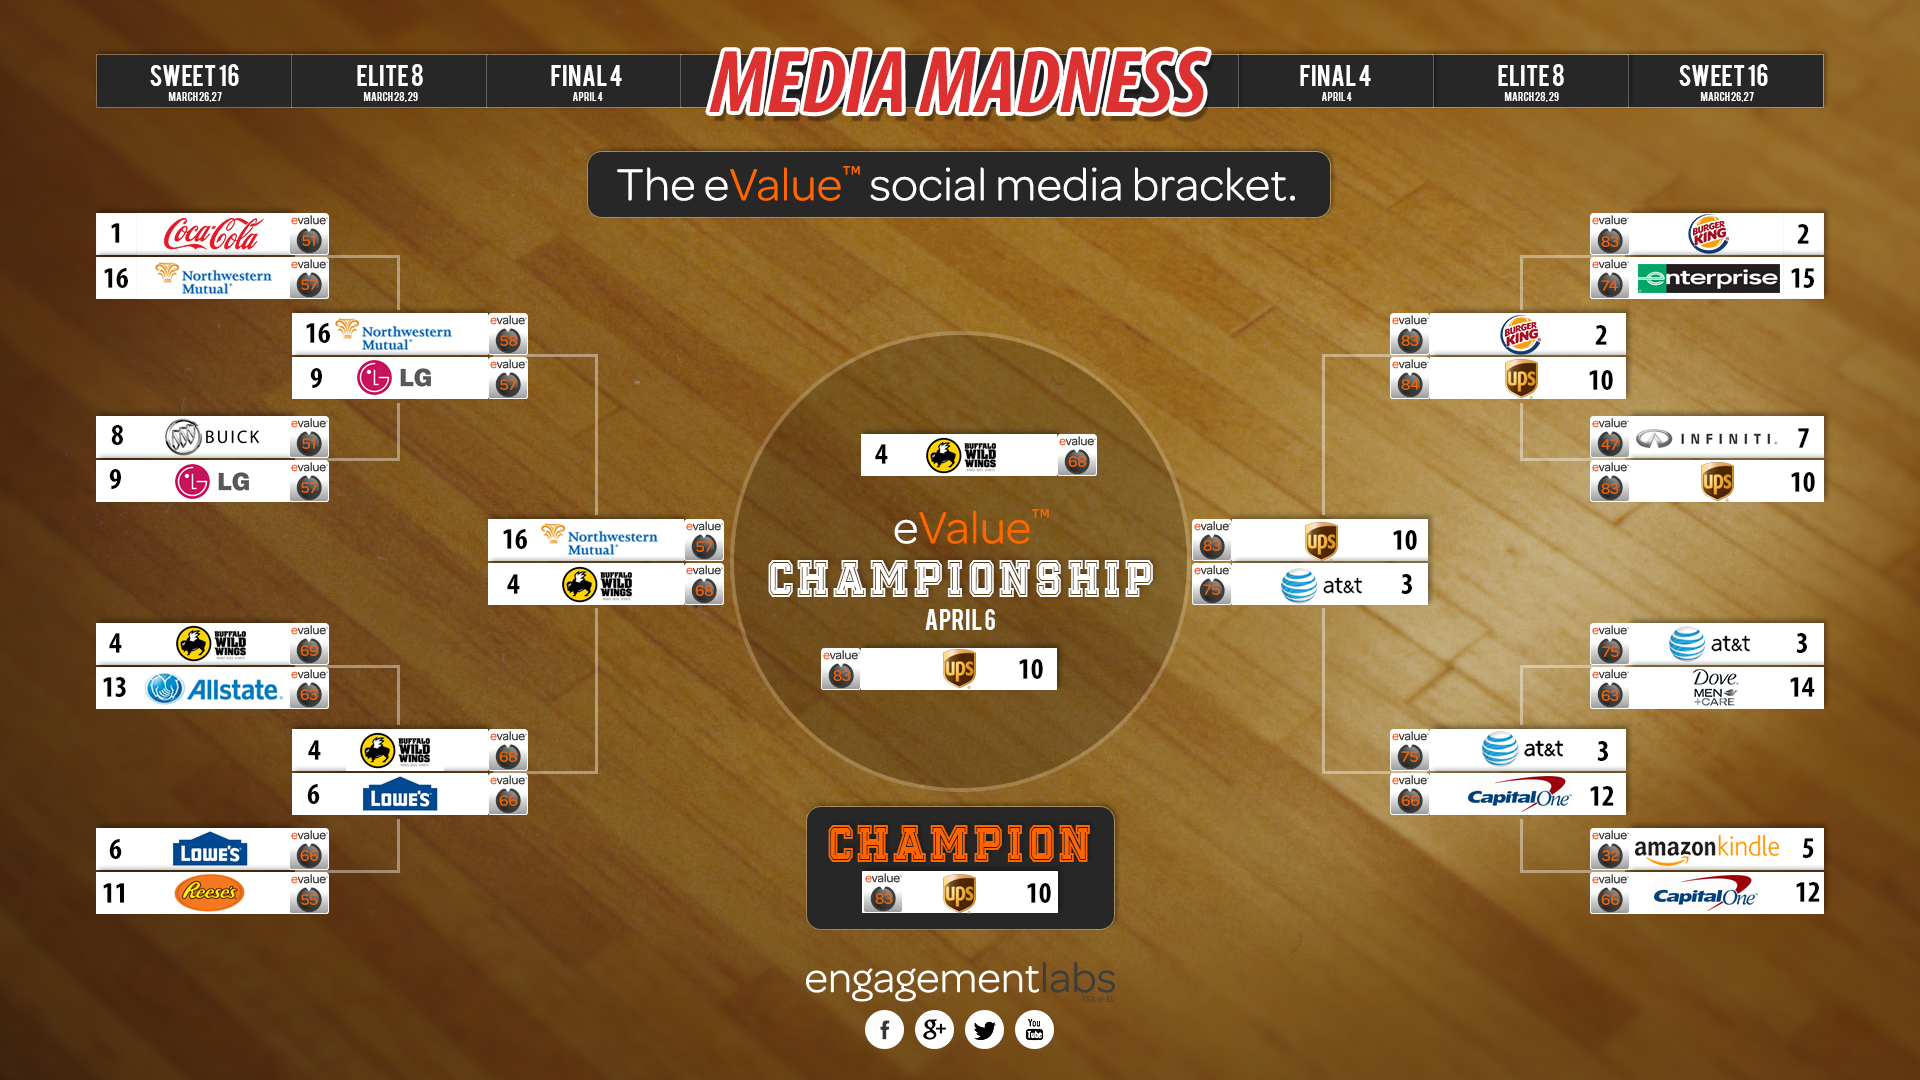 eValue Media Madness 2015 Bracket - NCAA Tournament Sponsors | engagementlabs.com